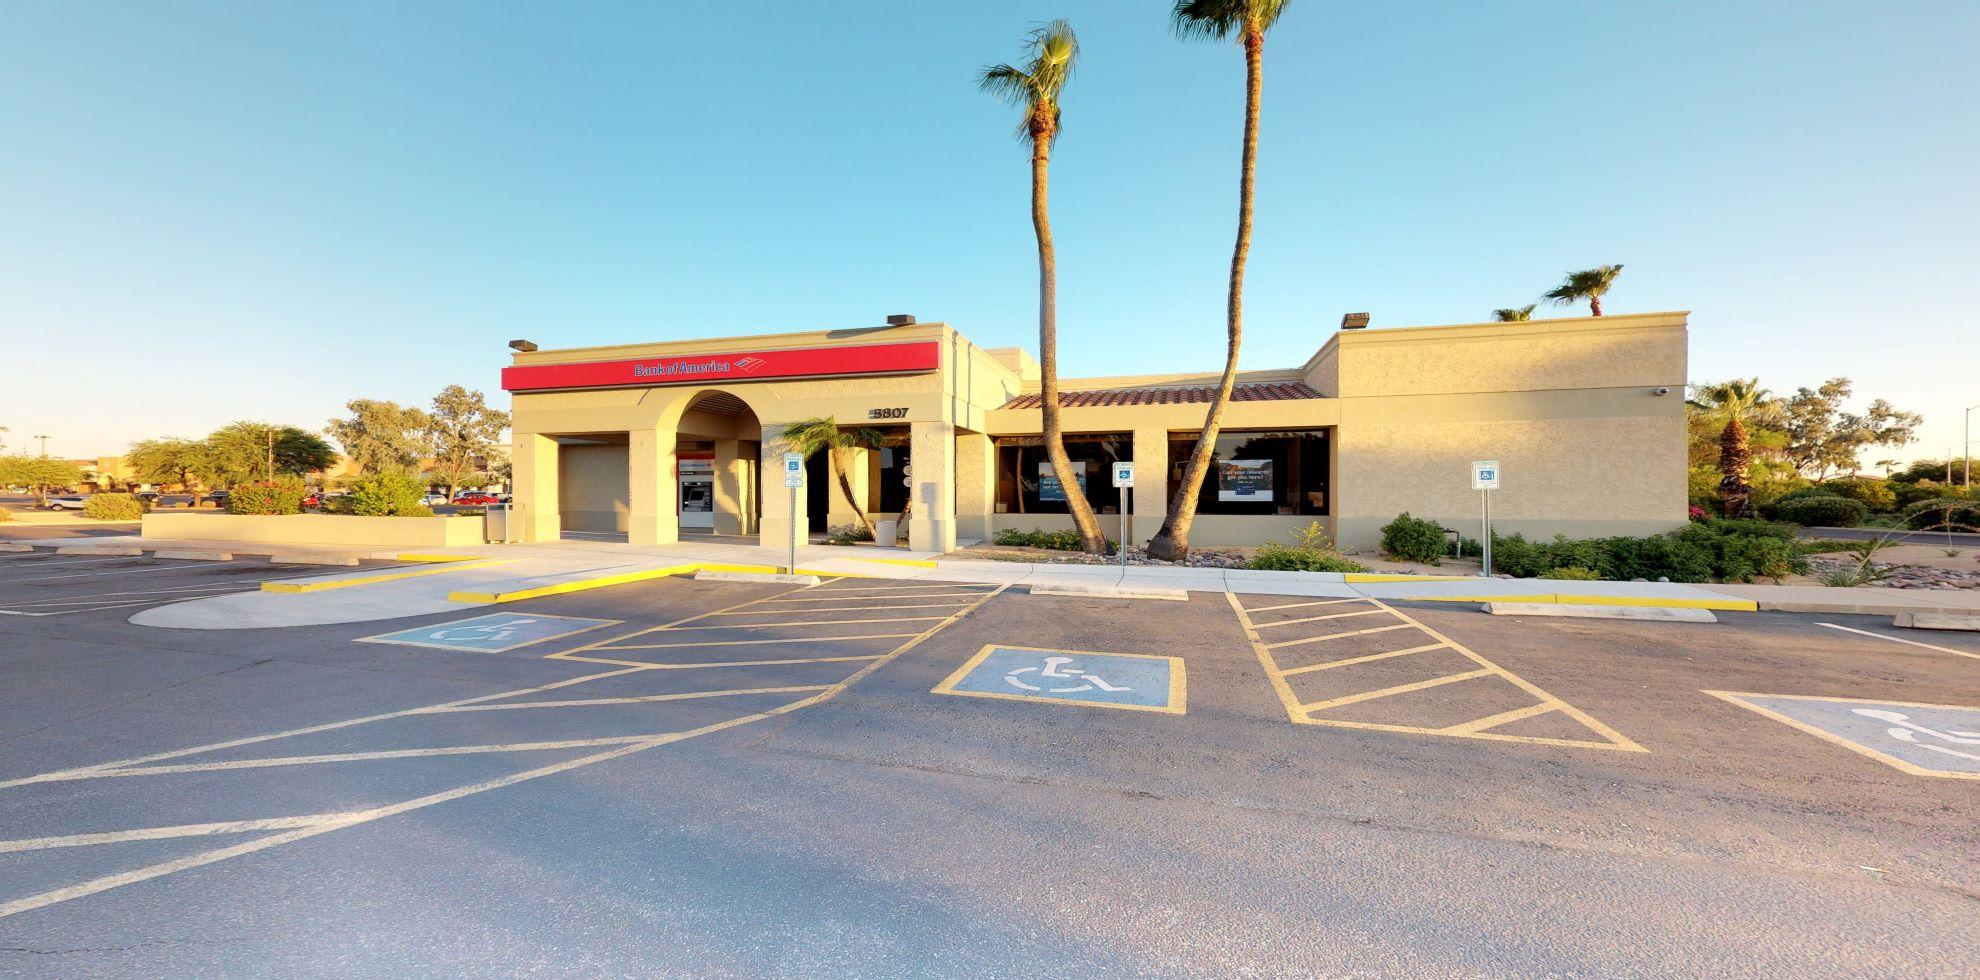 Bank of America financial center with drive-thru ATM | 5807 E McKellips Rd, Mesa, AZ 85215